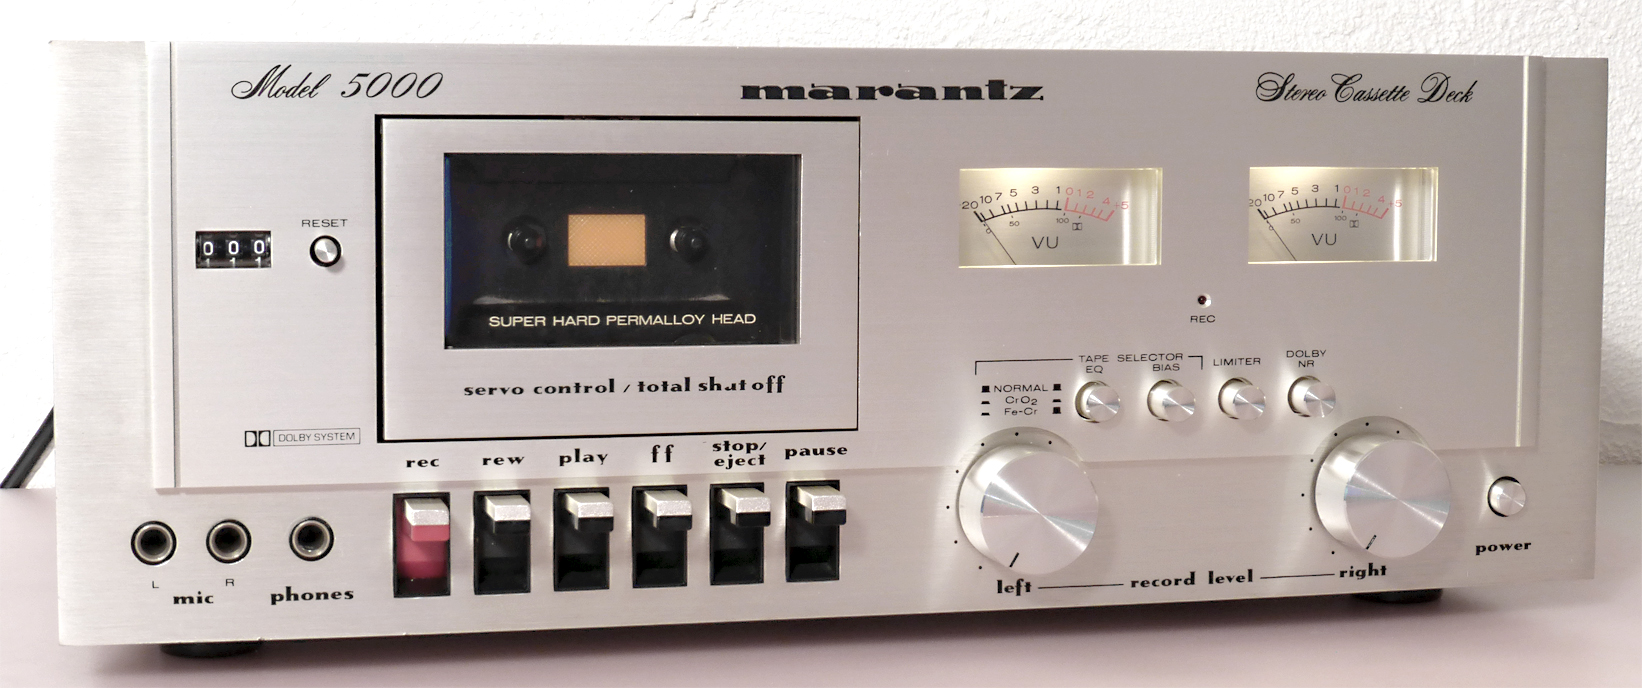 MARANTZ MODEL 5000